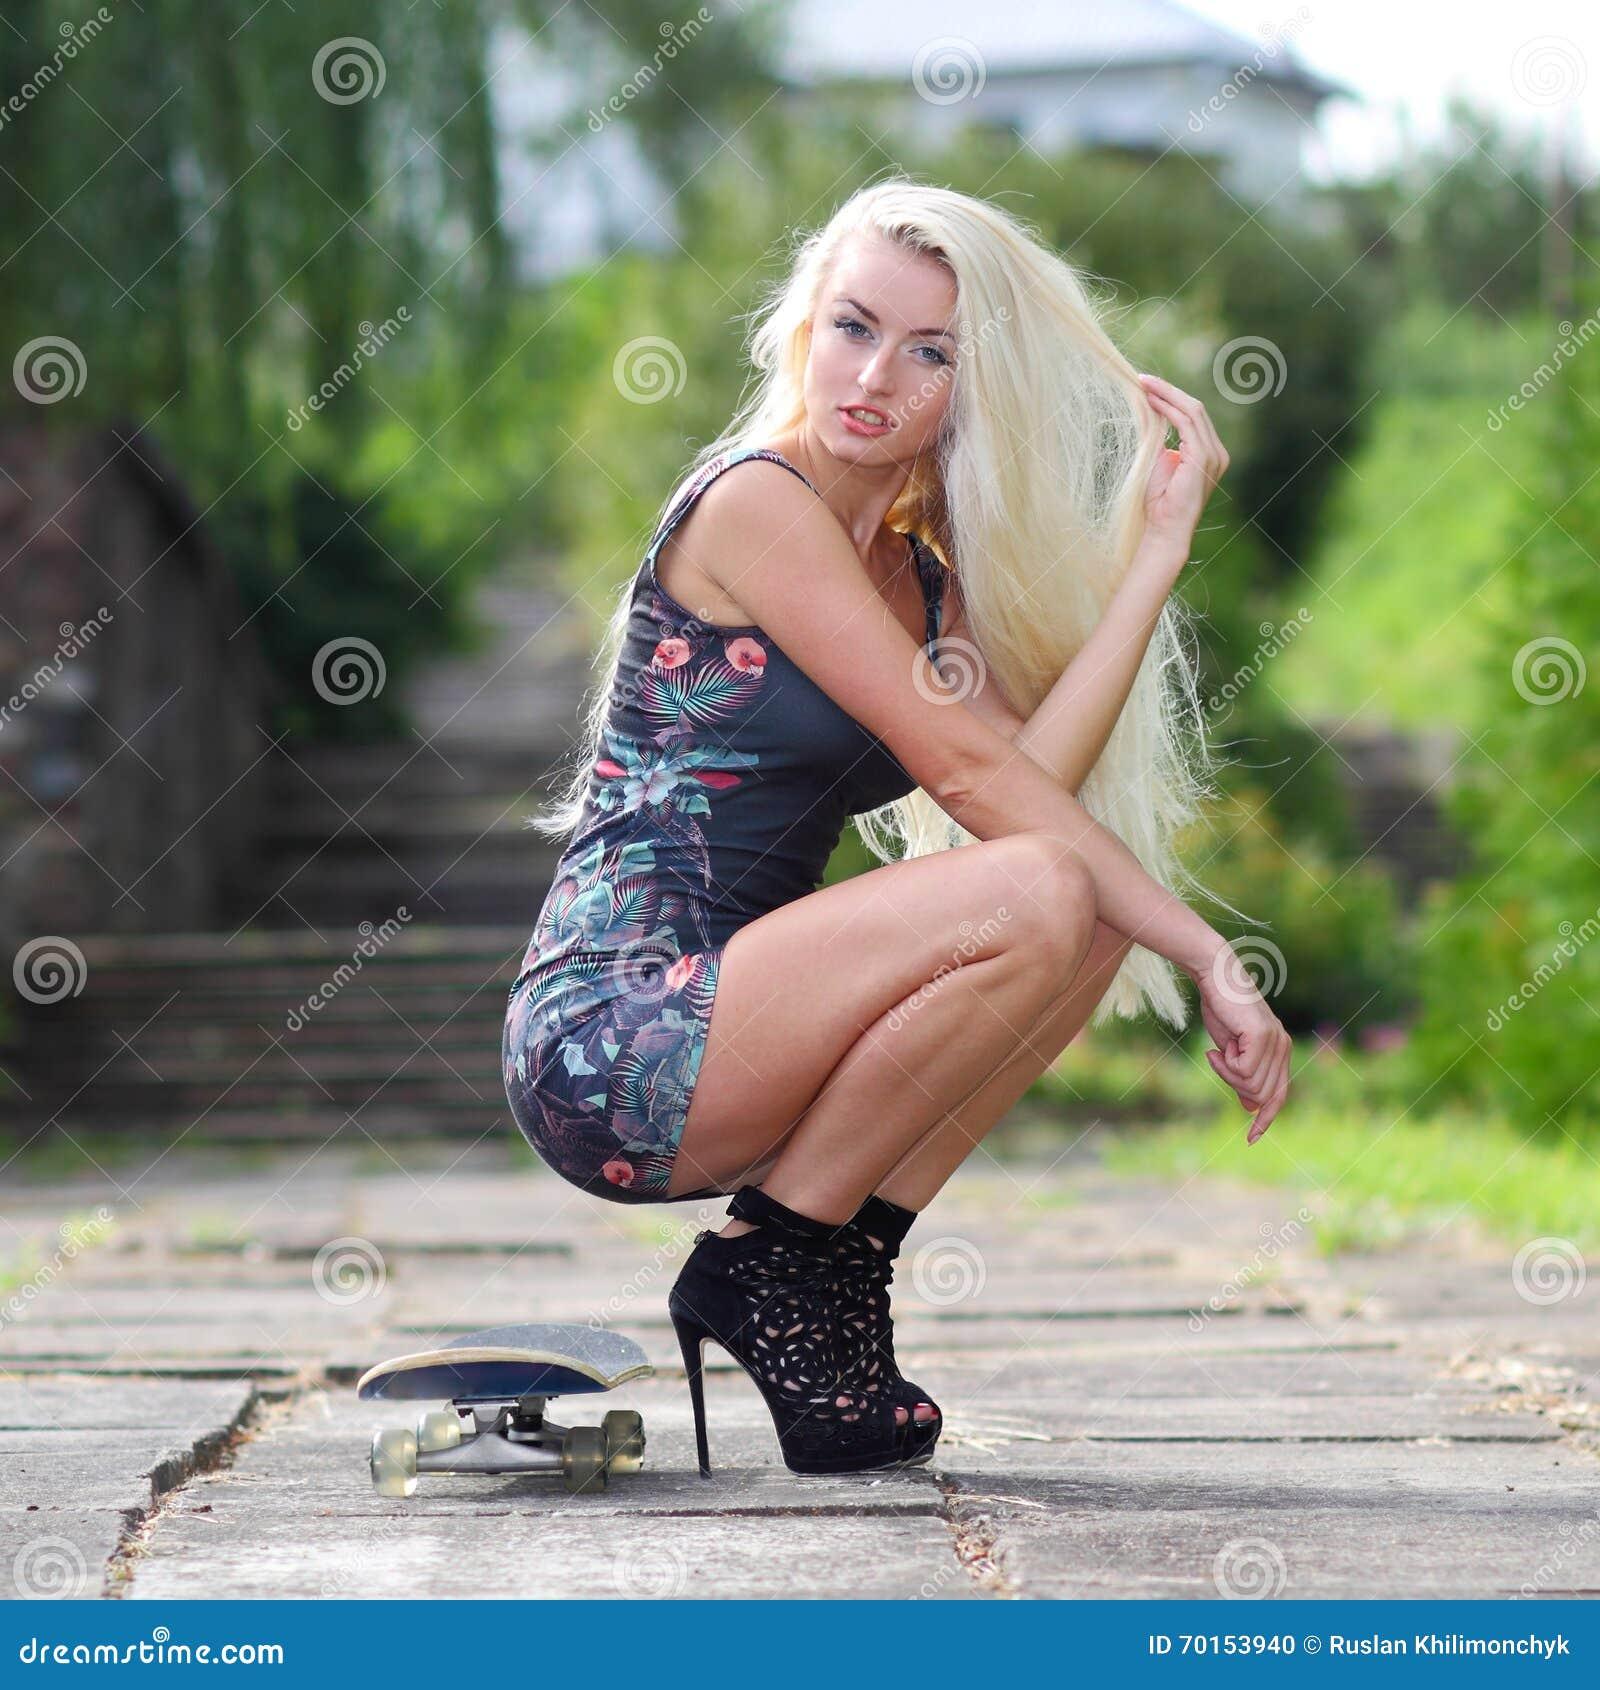 Blonde High Heels